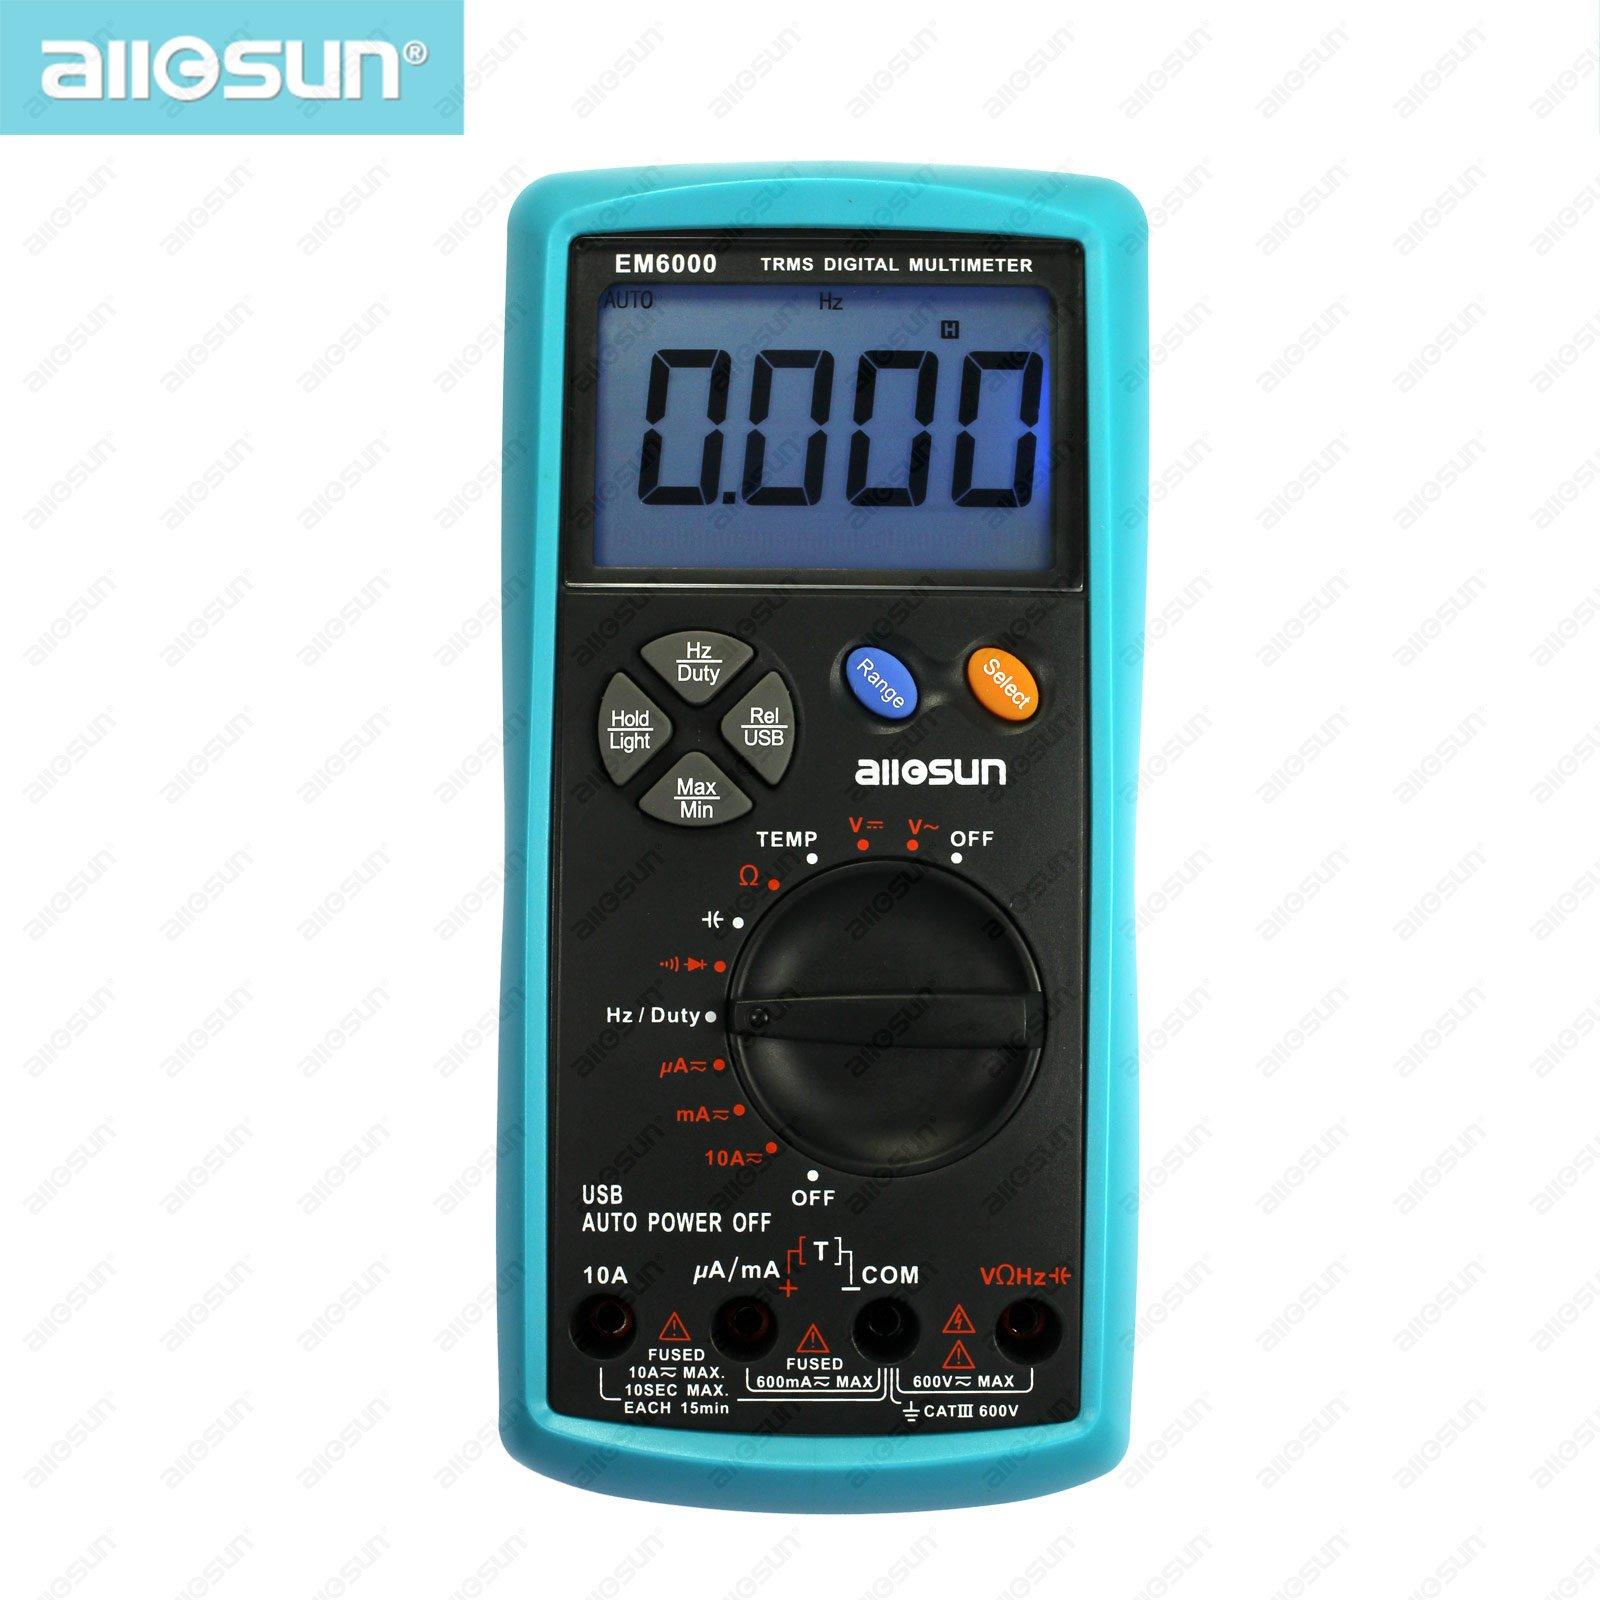 all-sun EM6000 Professional True RMS digital multimeter 3 5/6-digit LCD display multimeter max/min value recording tester